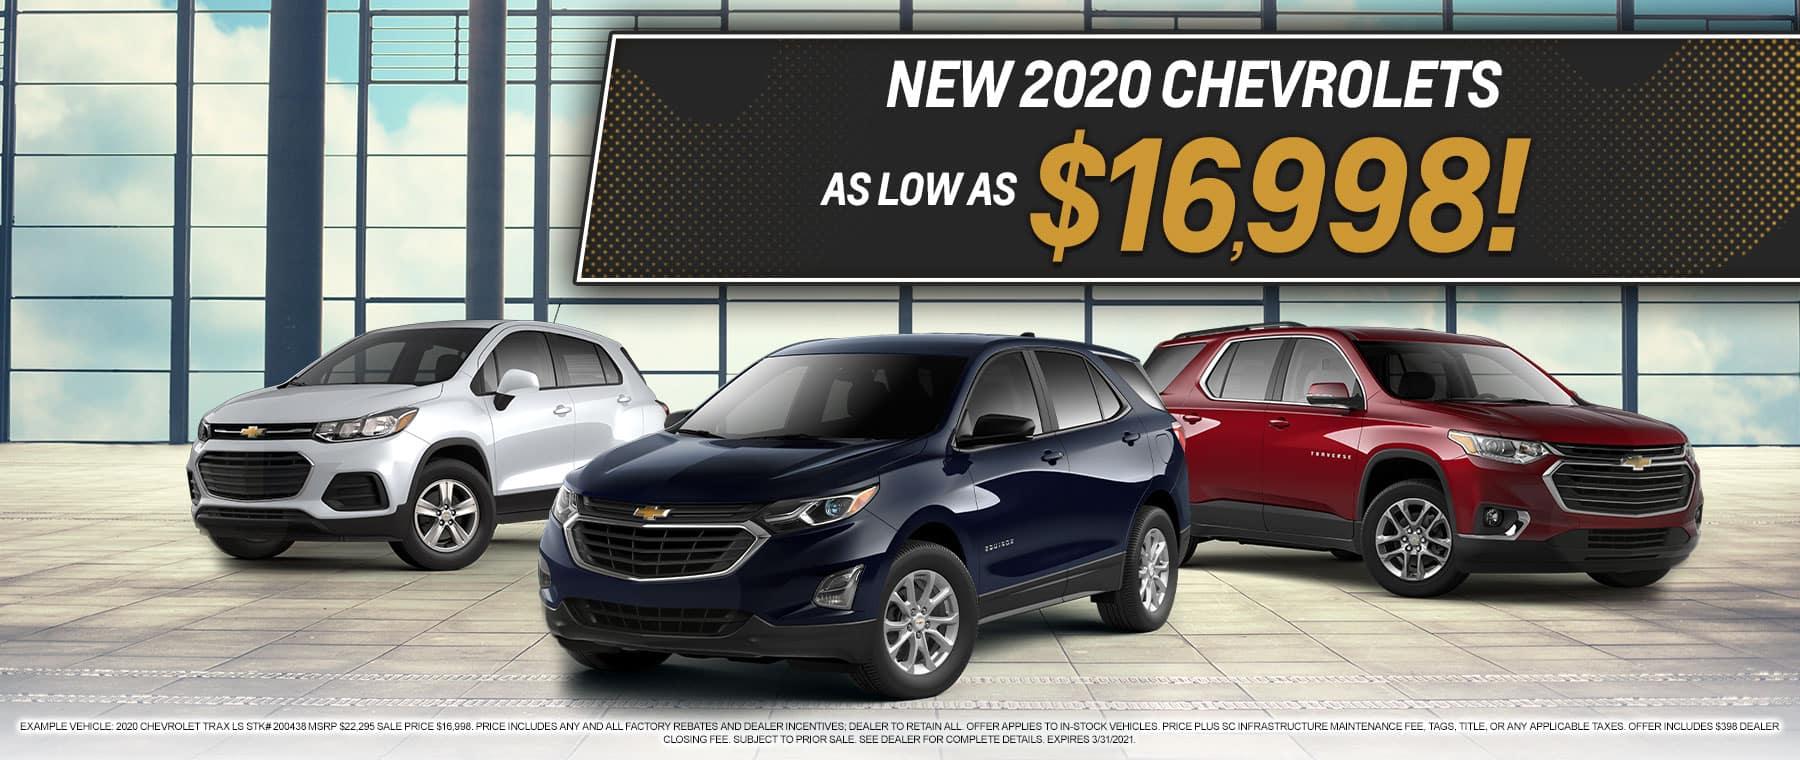 New 2020 Chevrolets